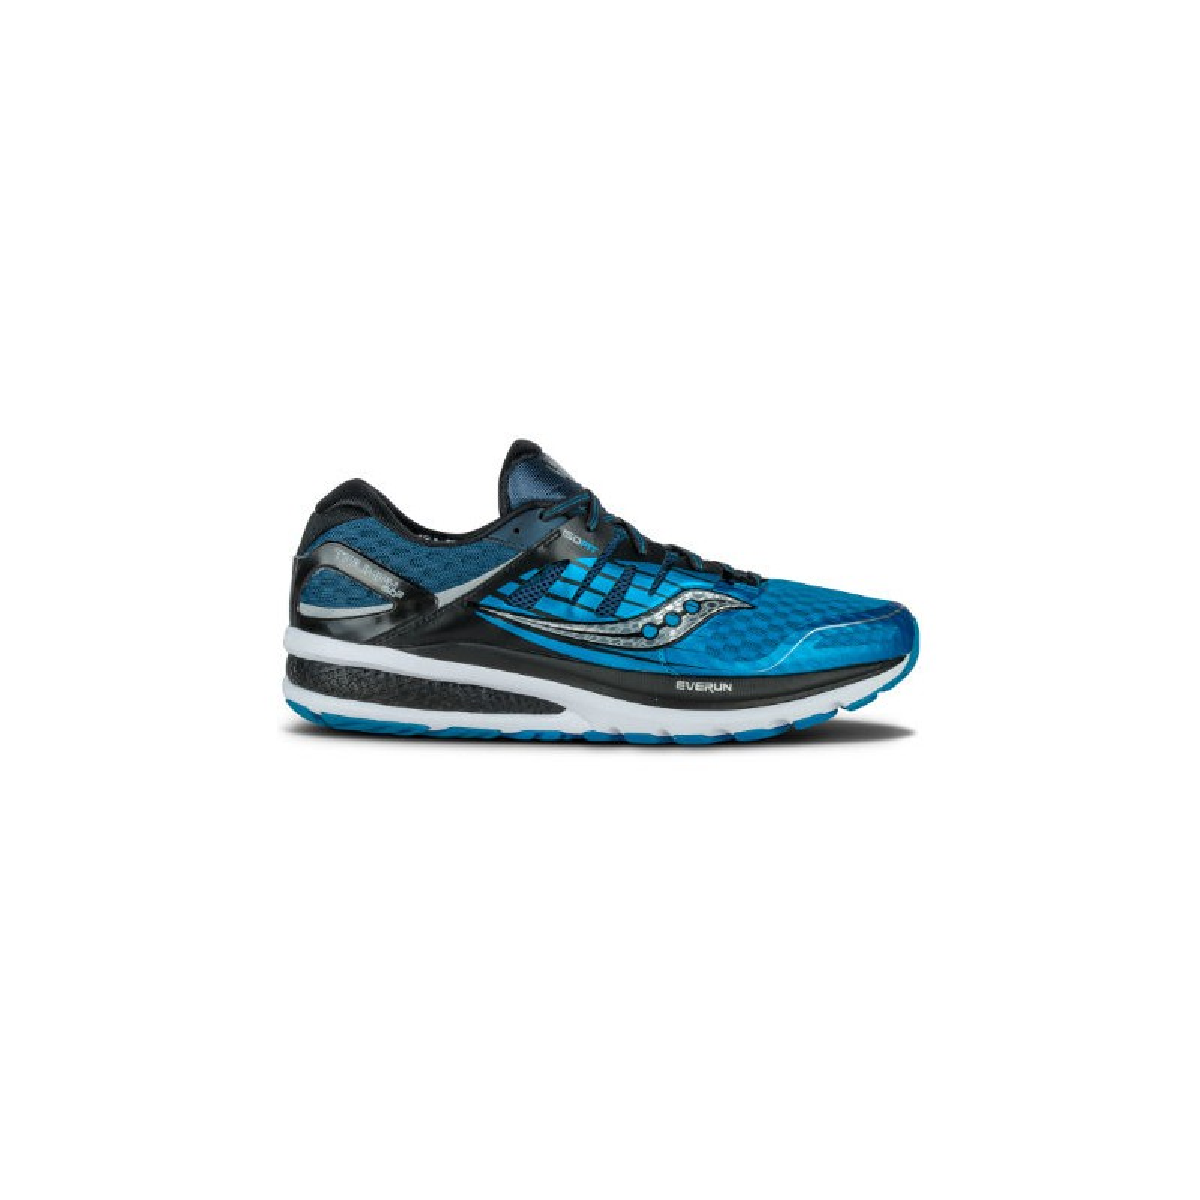 Saucony Triumph ISO 2 Everun OI16 azul/negro